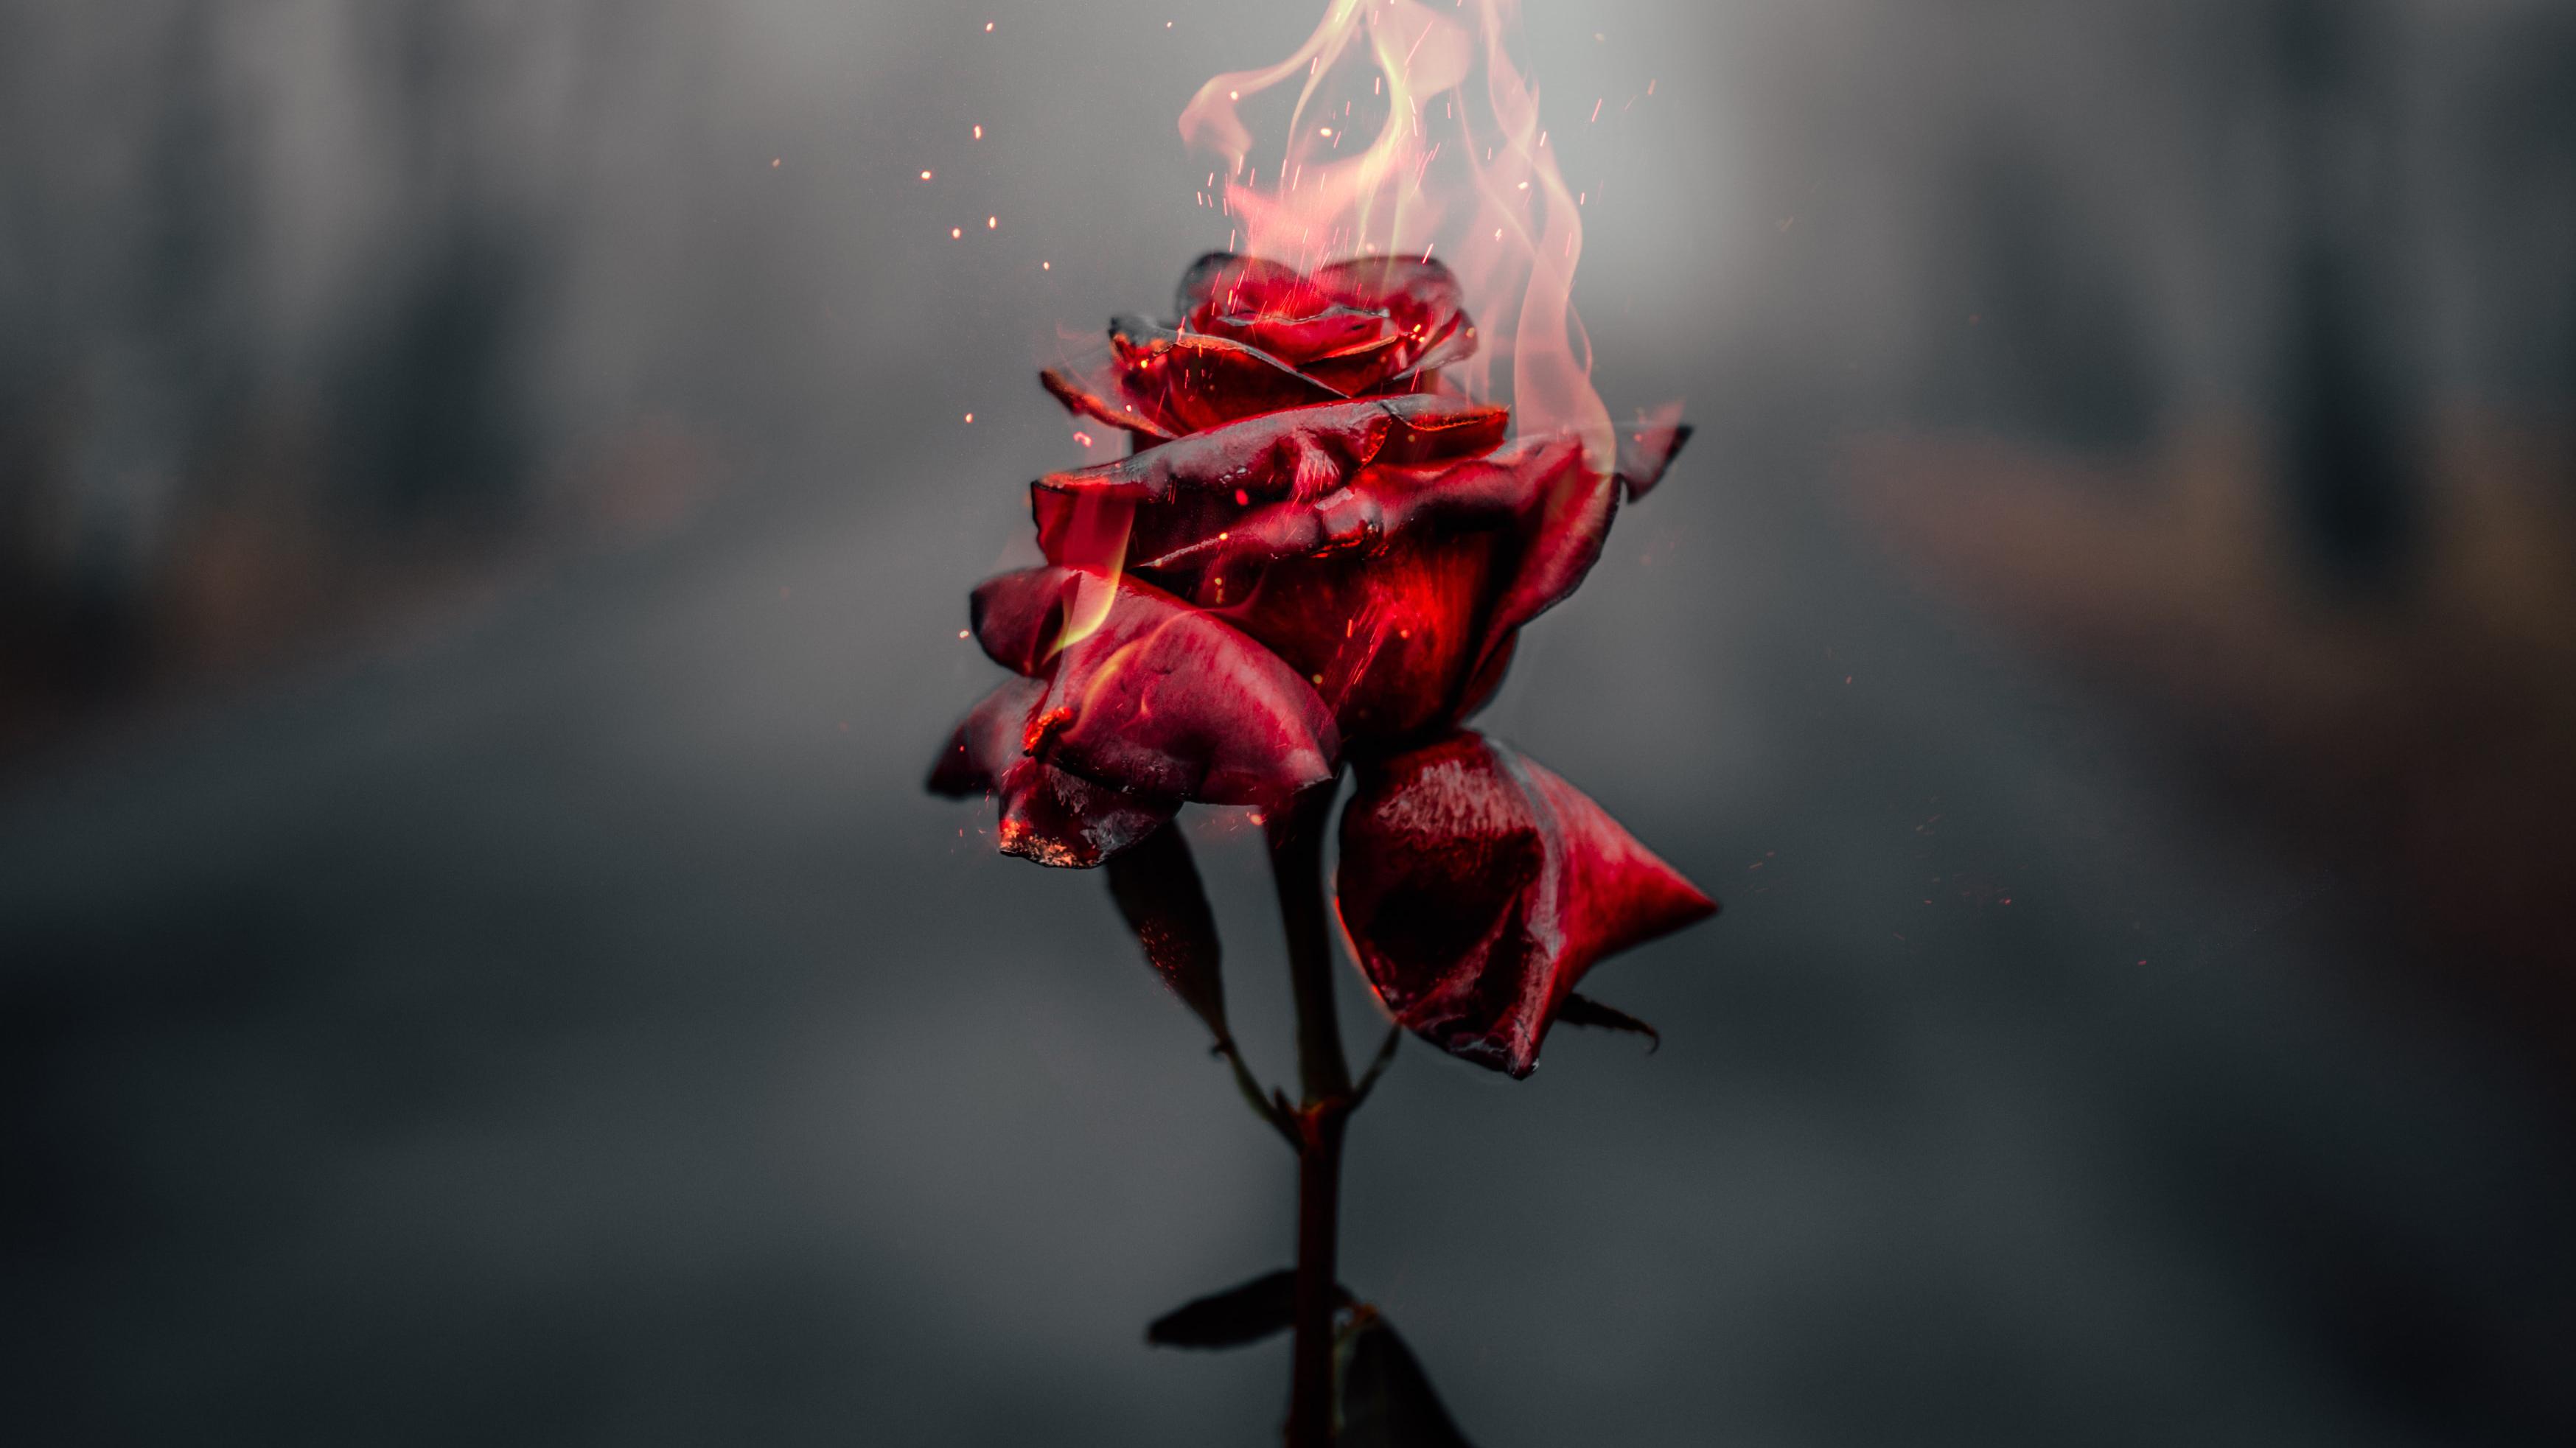 Artistic Rose 3495x1965